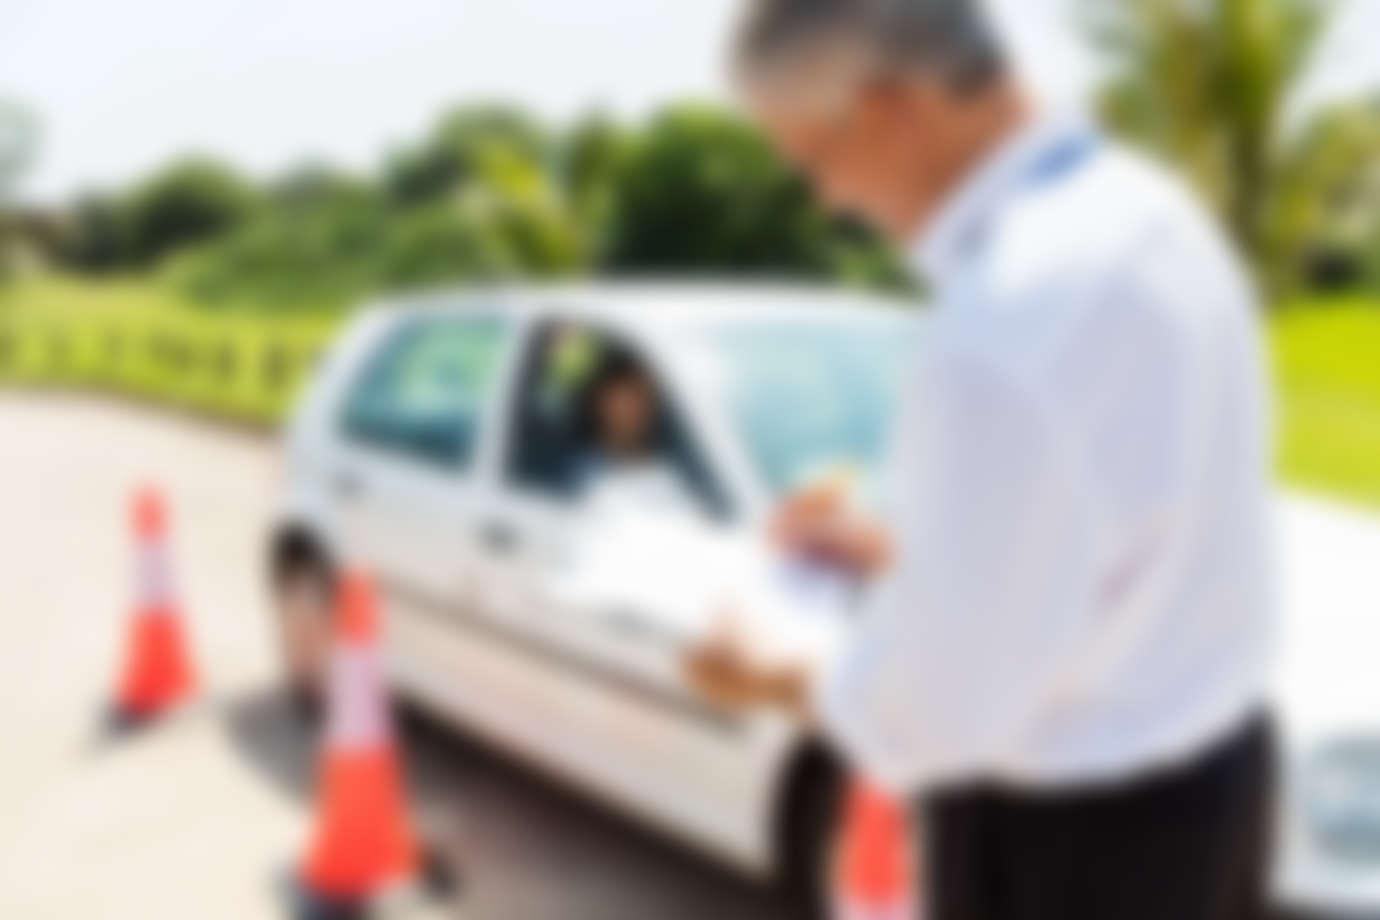 DMV Test: One-hour pre-test